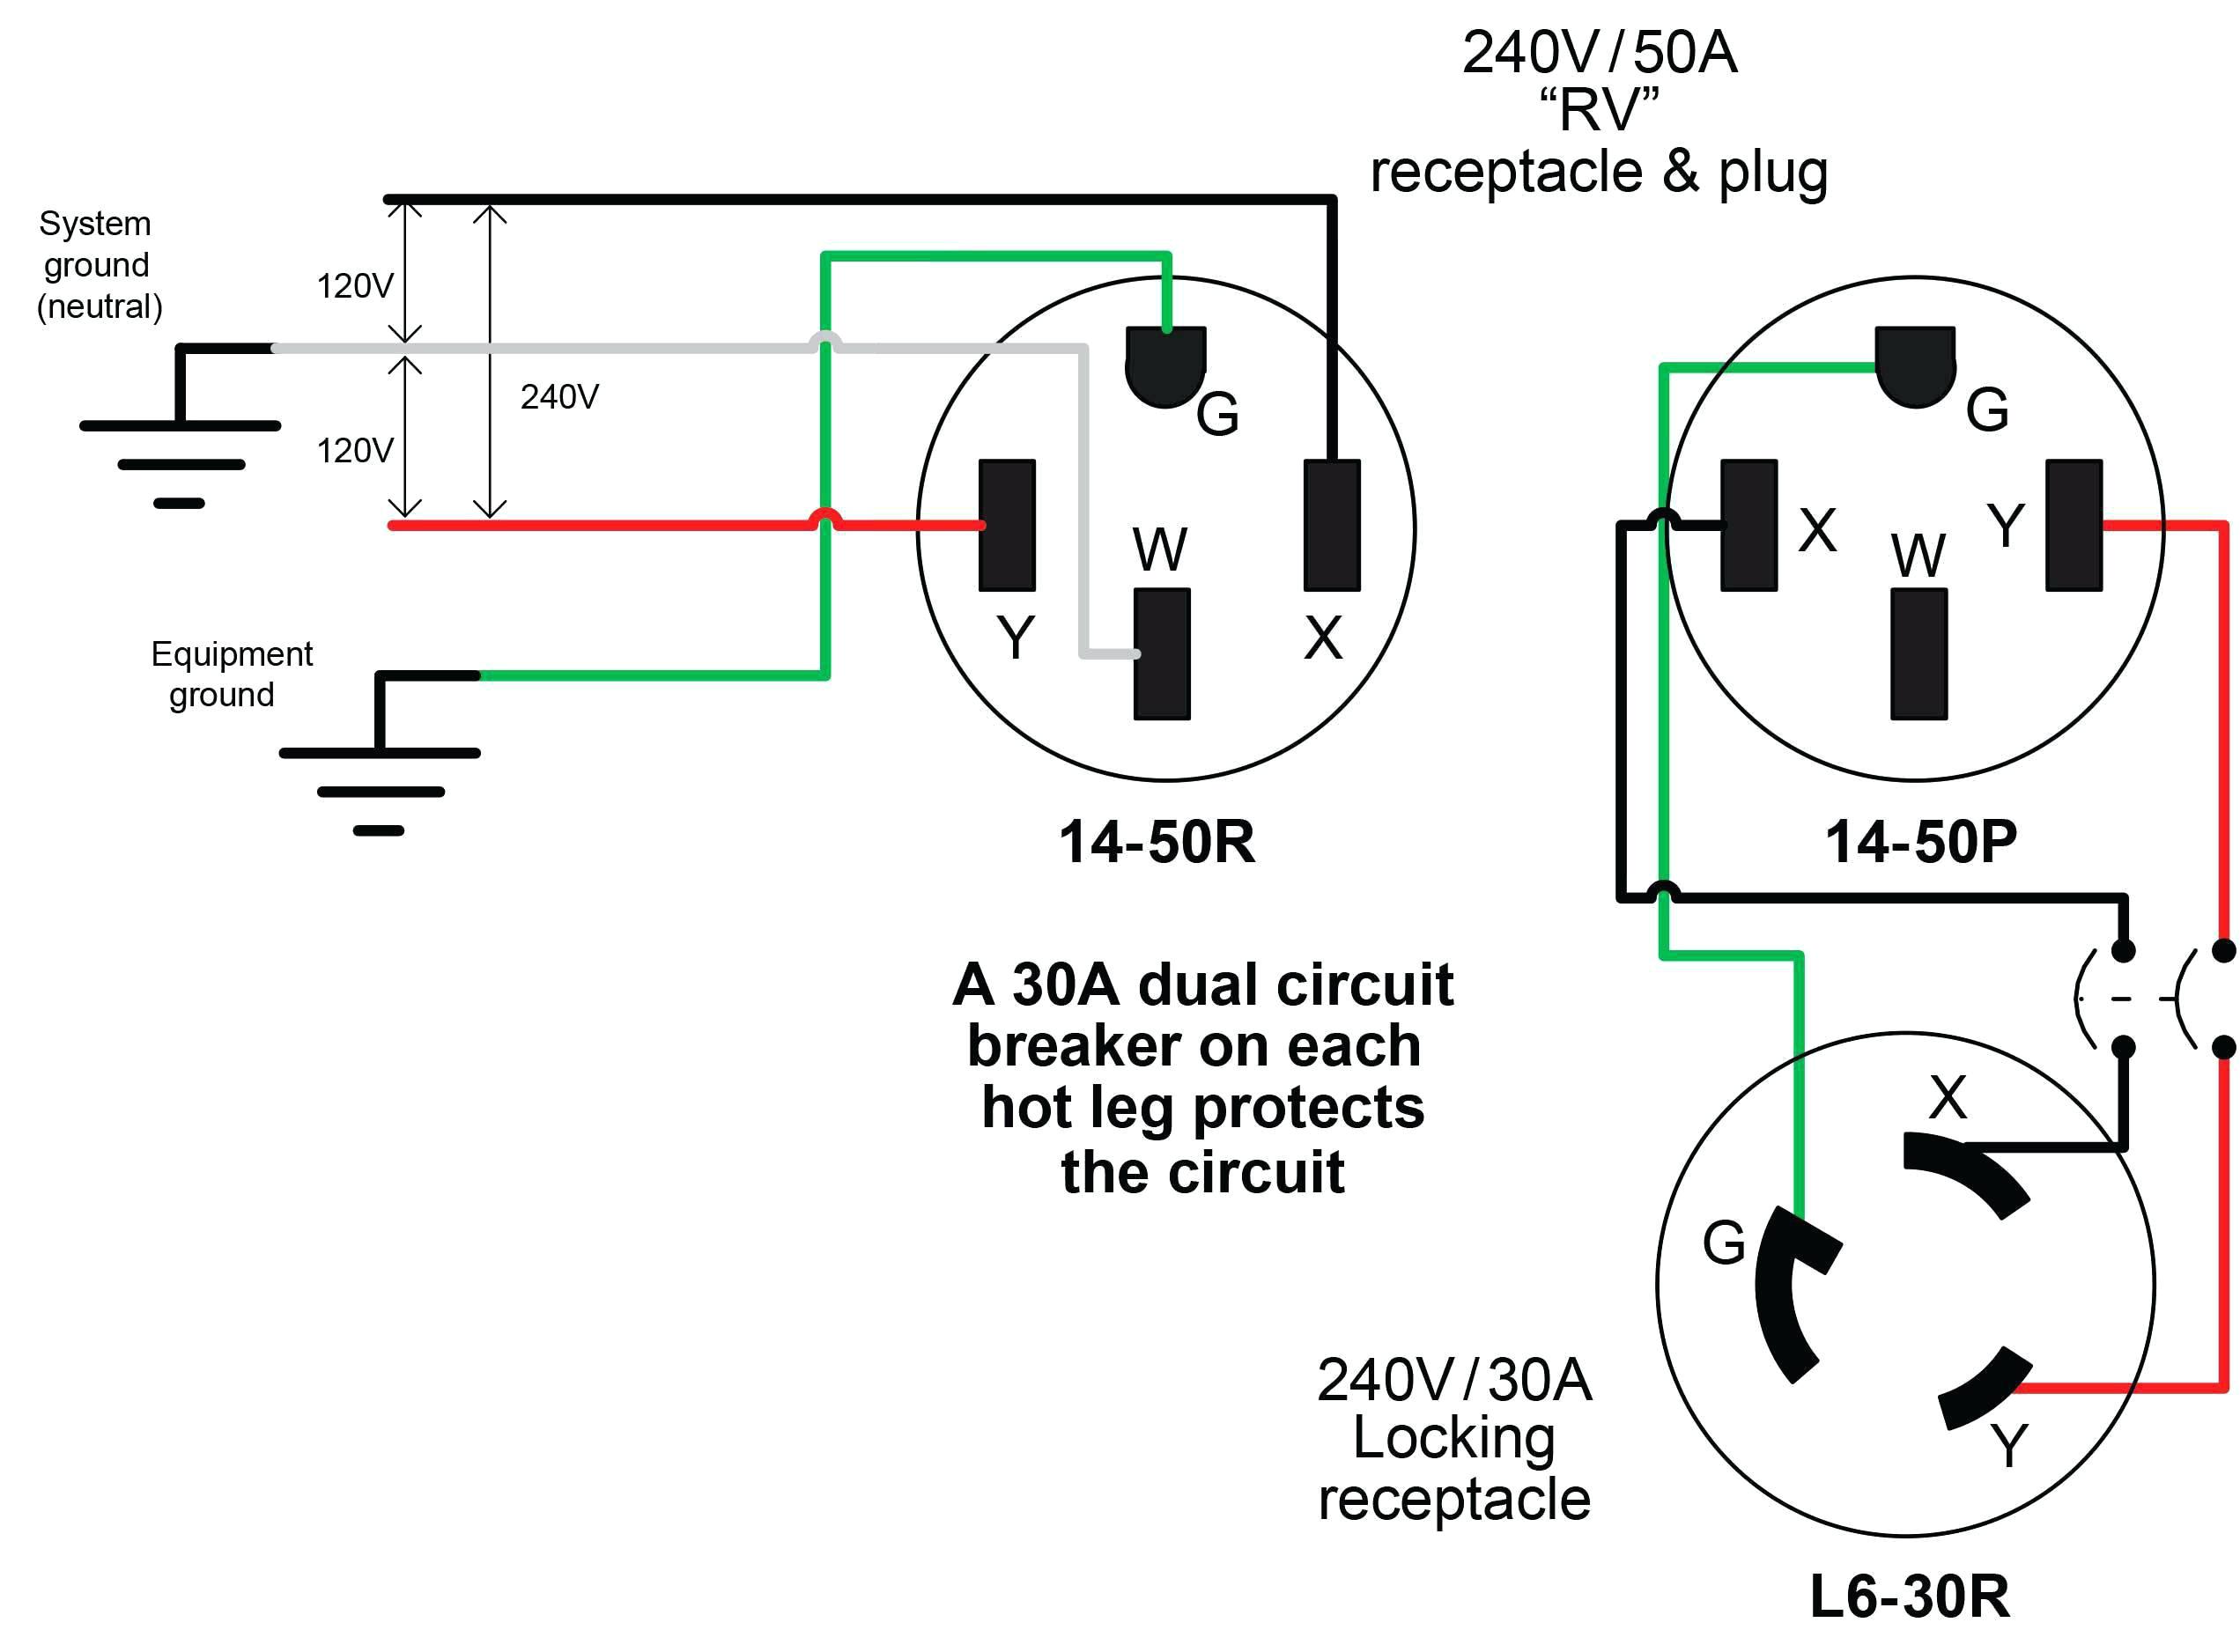 nema 6 20r 240v wiring diagram wiring diagram paper nema 5 20p wiring diagram 6